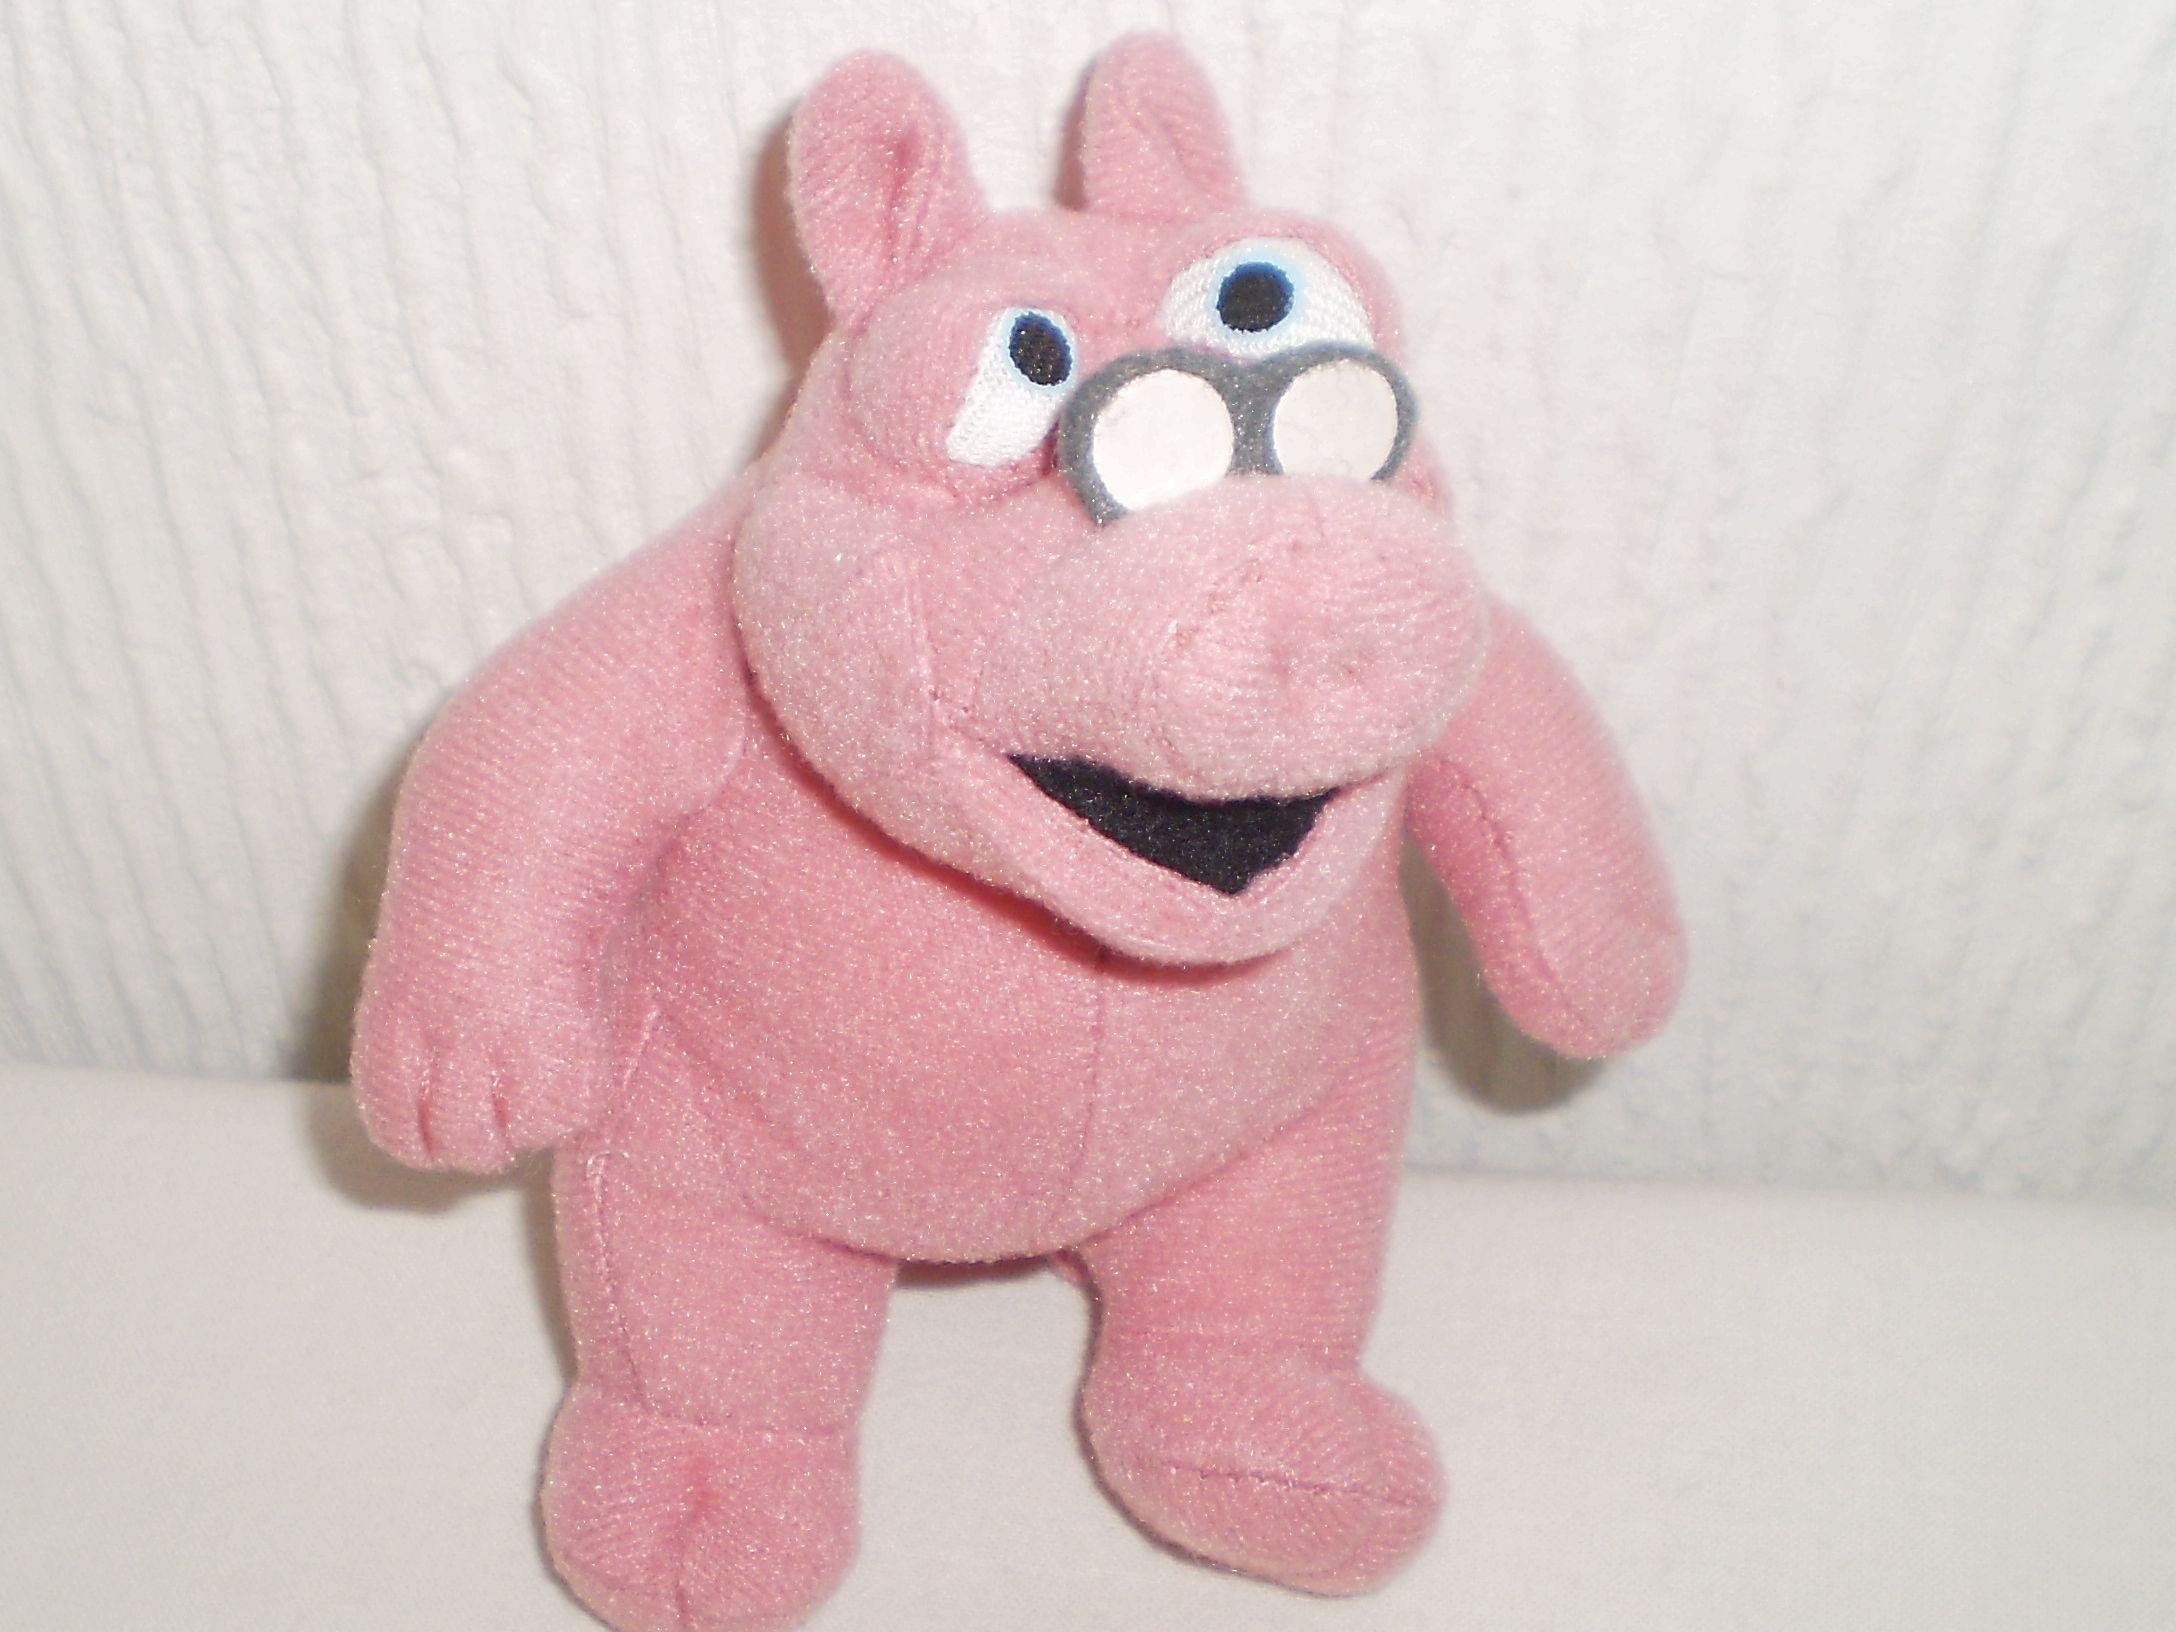 2002 doc hogg mcdonalds soft toy pig jim hensons bear in the big